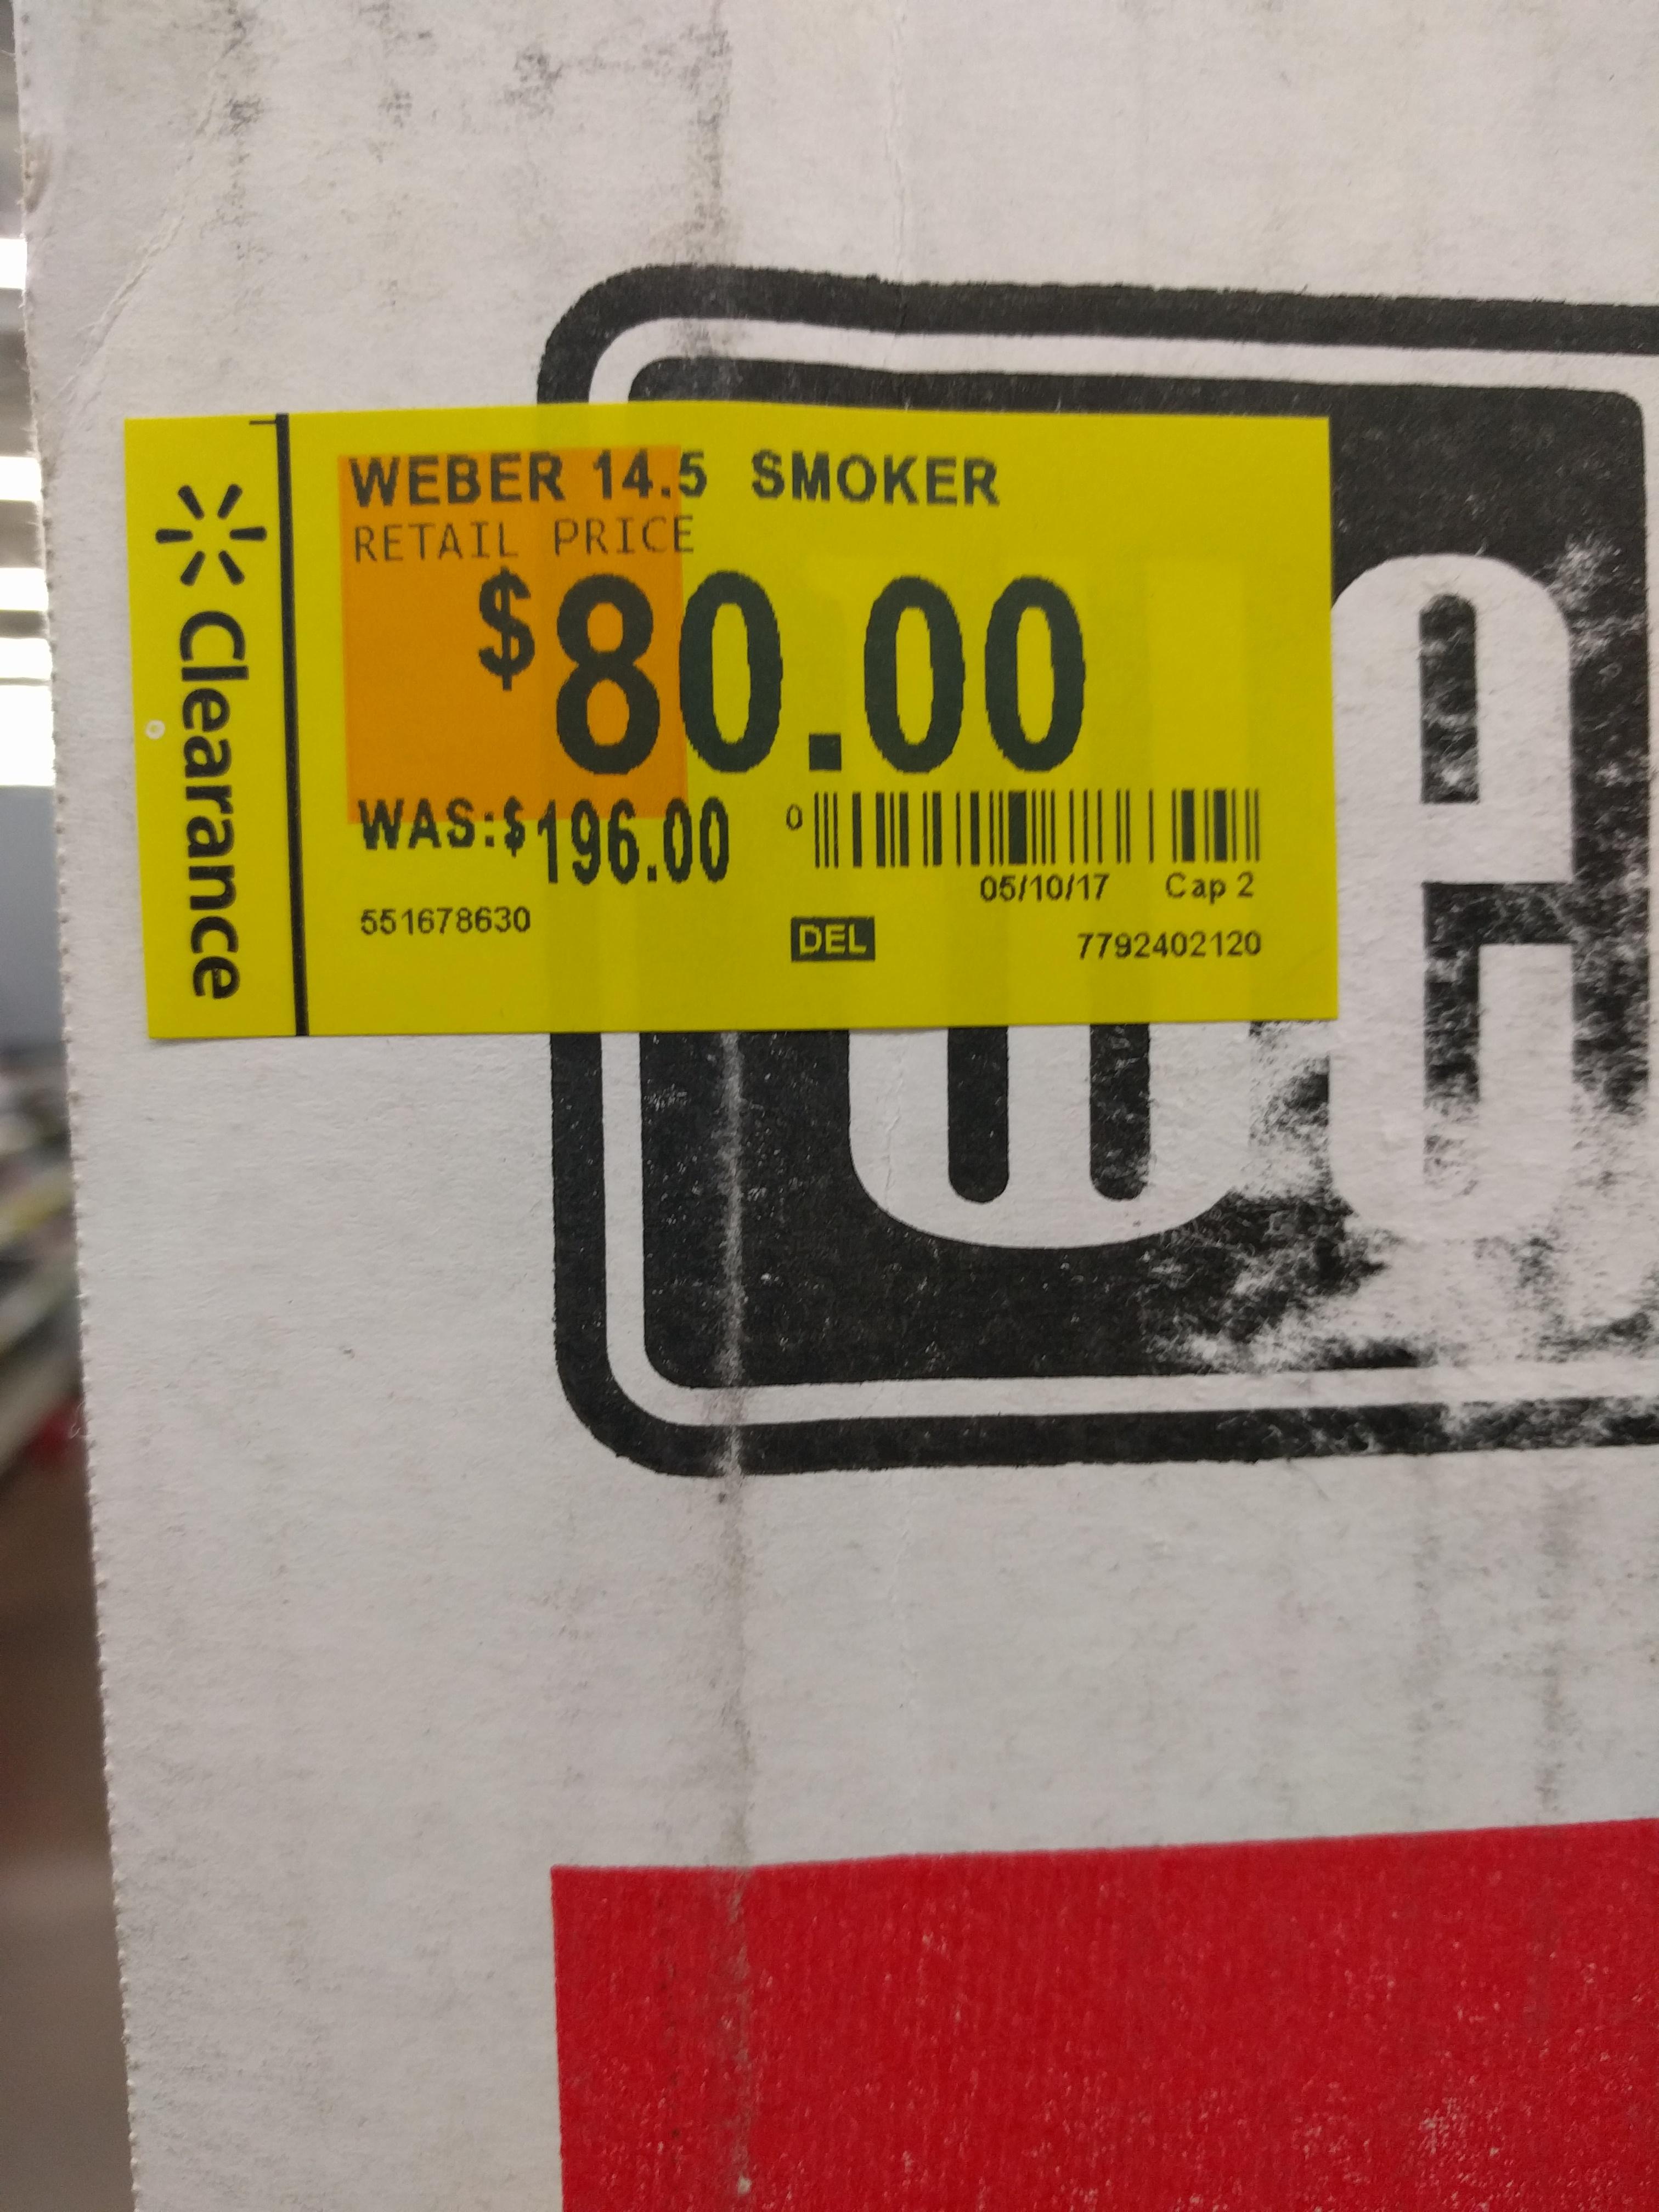 "Weber smokey mountain smoker 14.5"" at Walmart b&m for $80 YMMV"